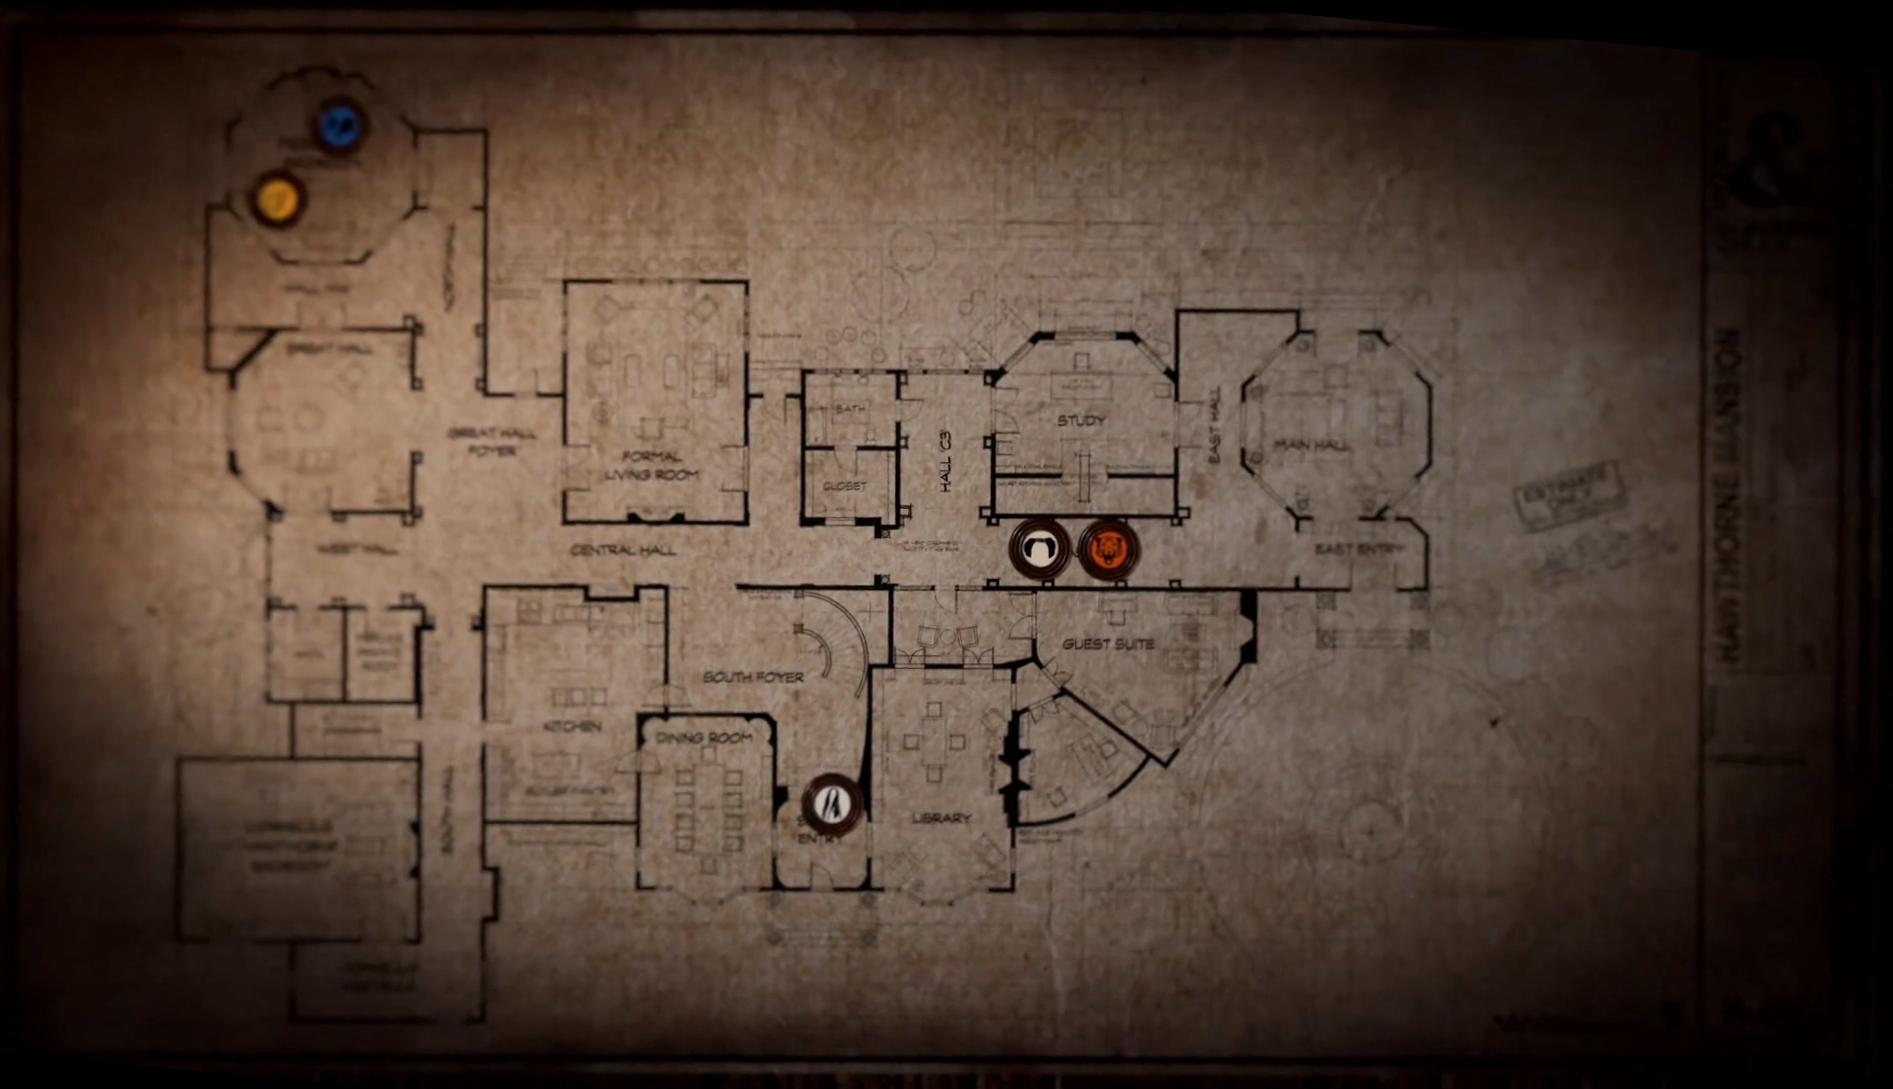 Mansion Floor Plan.png